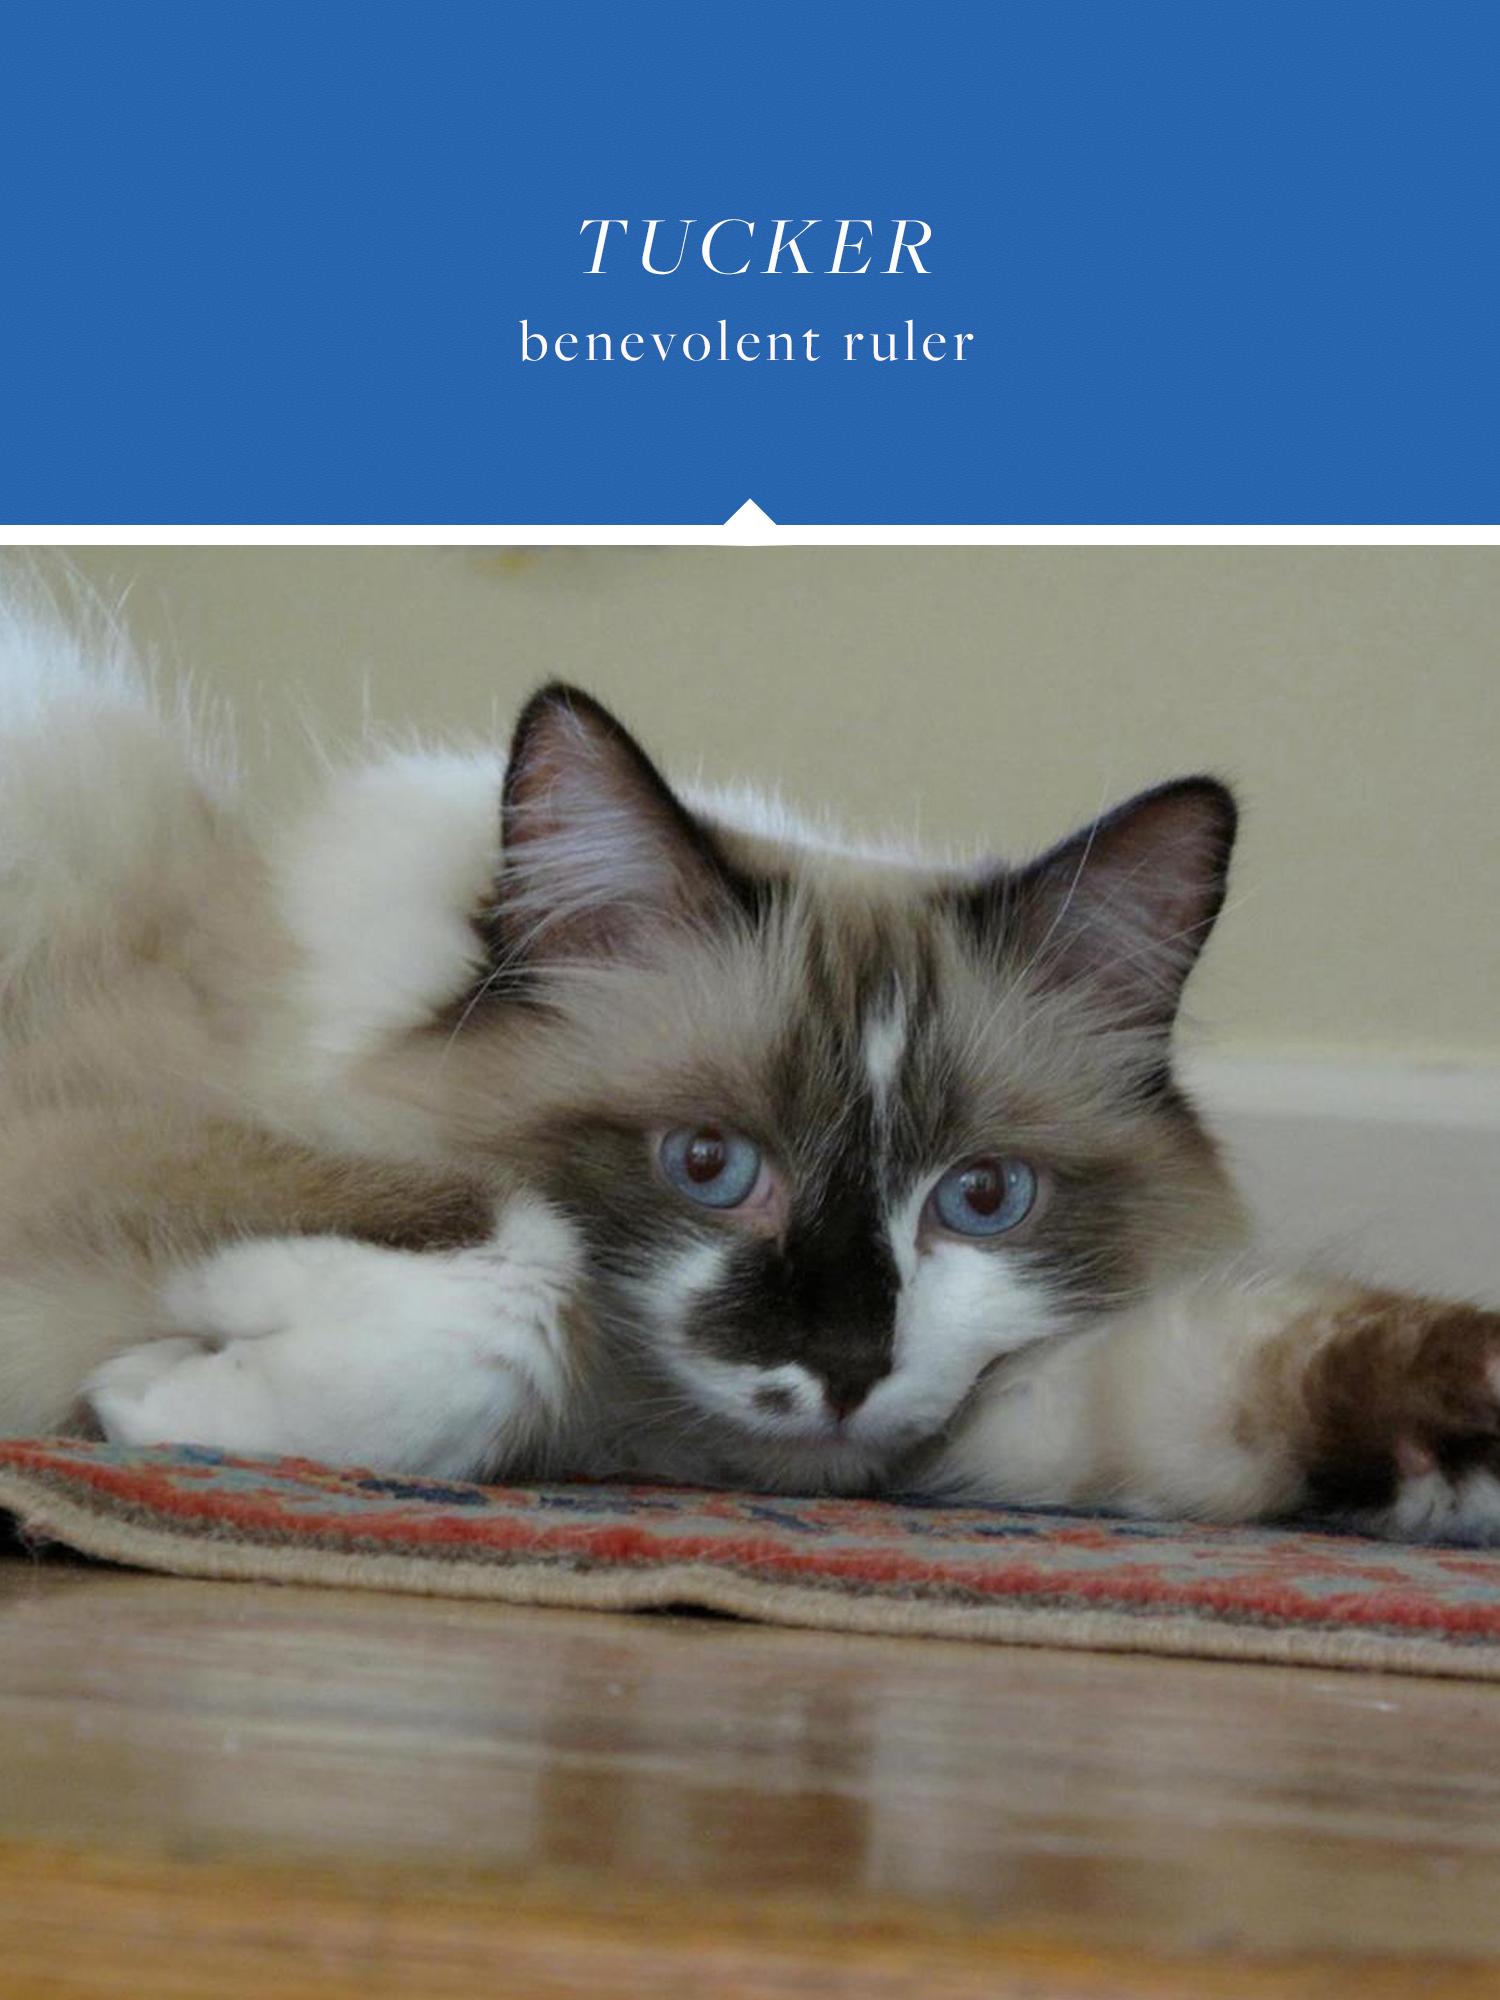 Tucker - the benevolent ruler